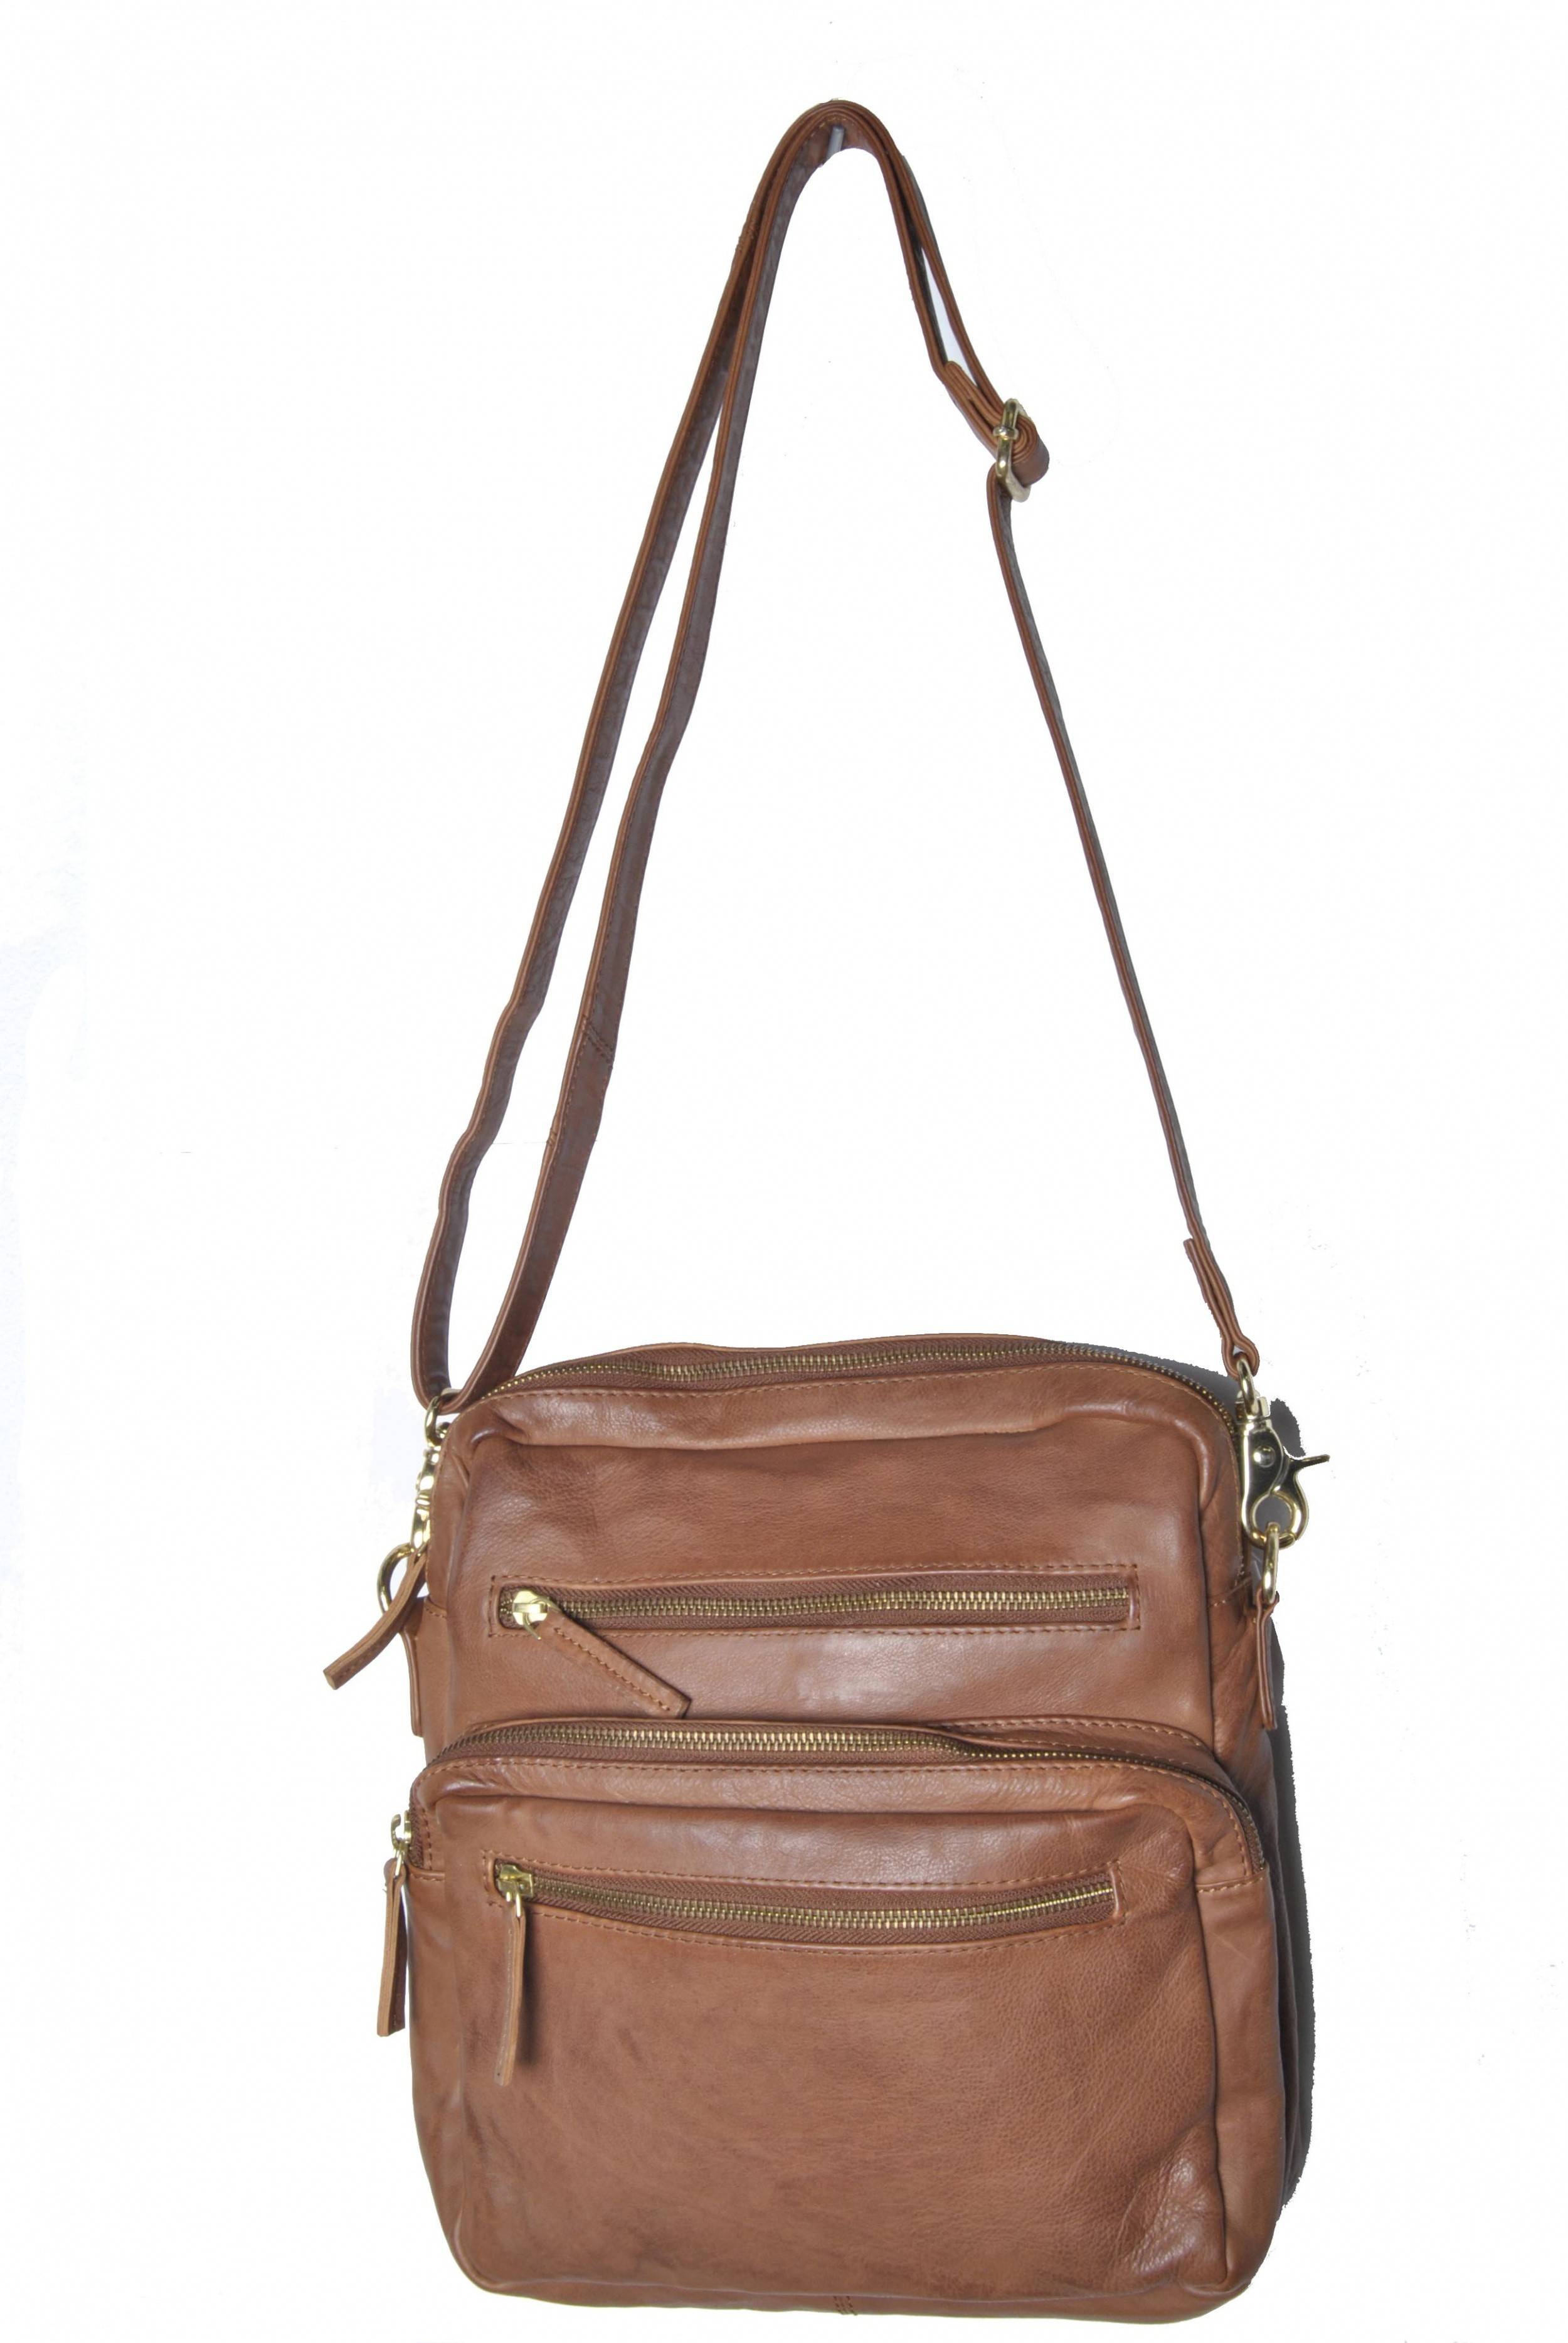 WouWou Messenger Bag 27012 Cognac